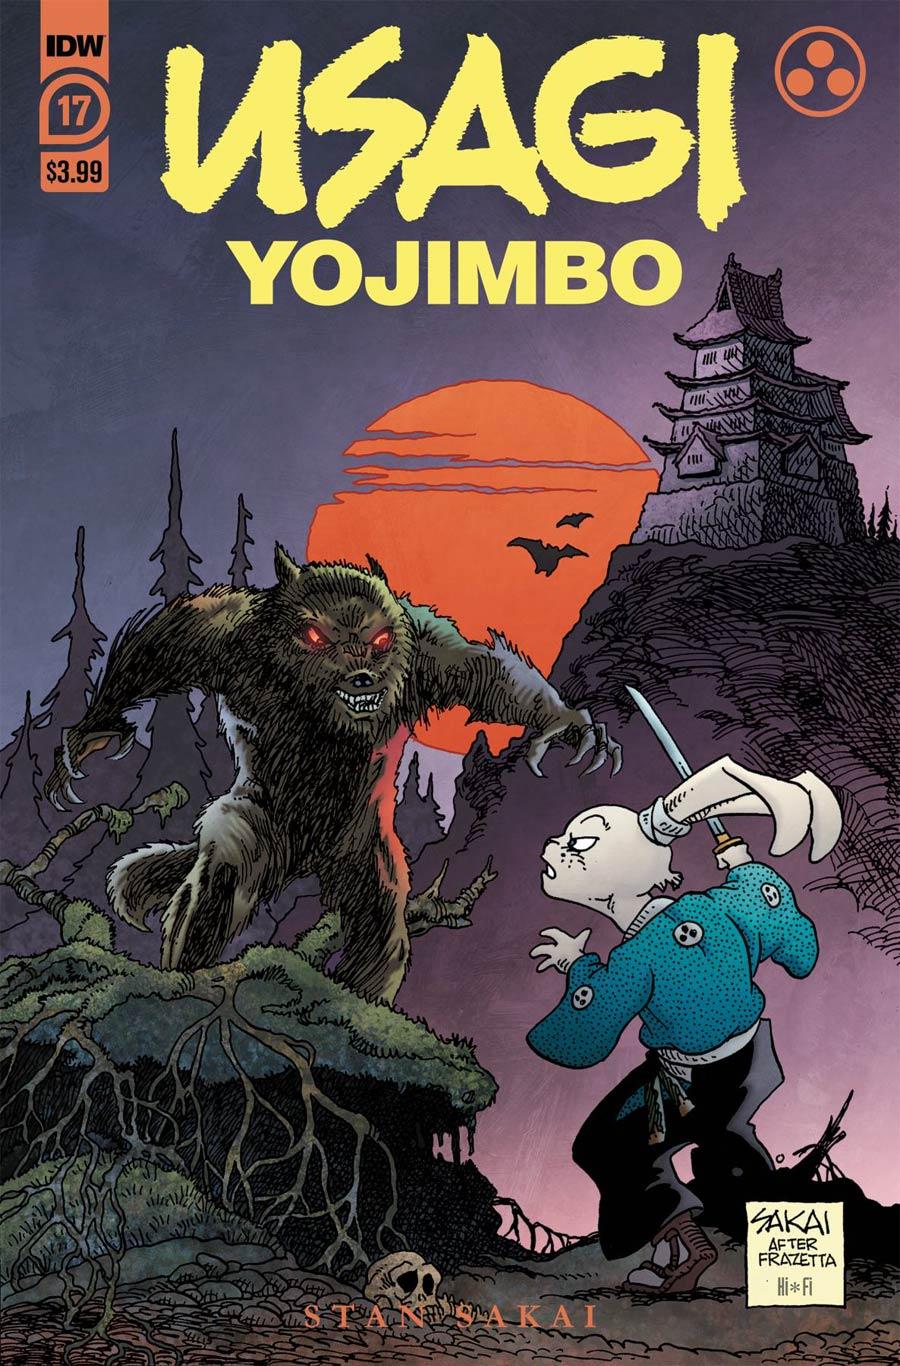 Usagi Yojimbo Vol 4 #17 Cover A Regular Stan Sakai Cover